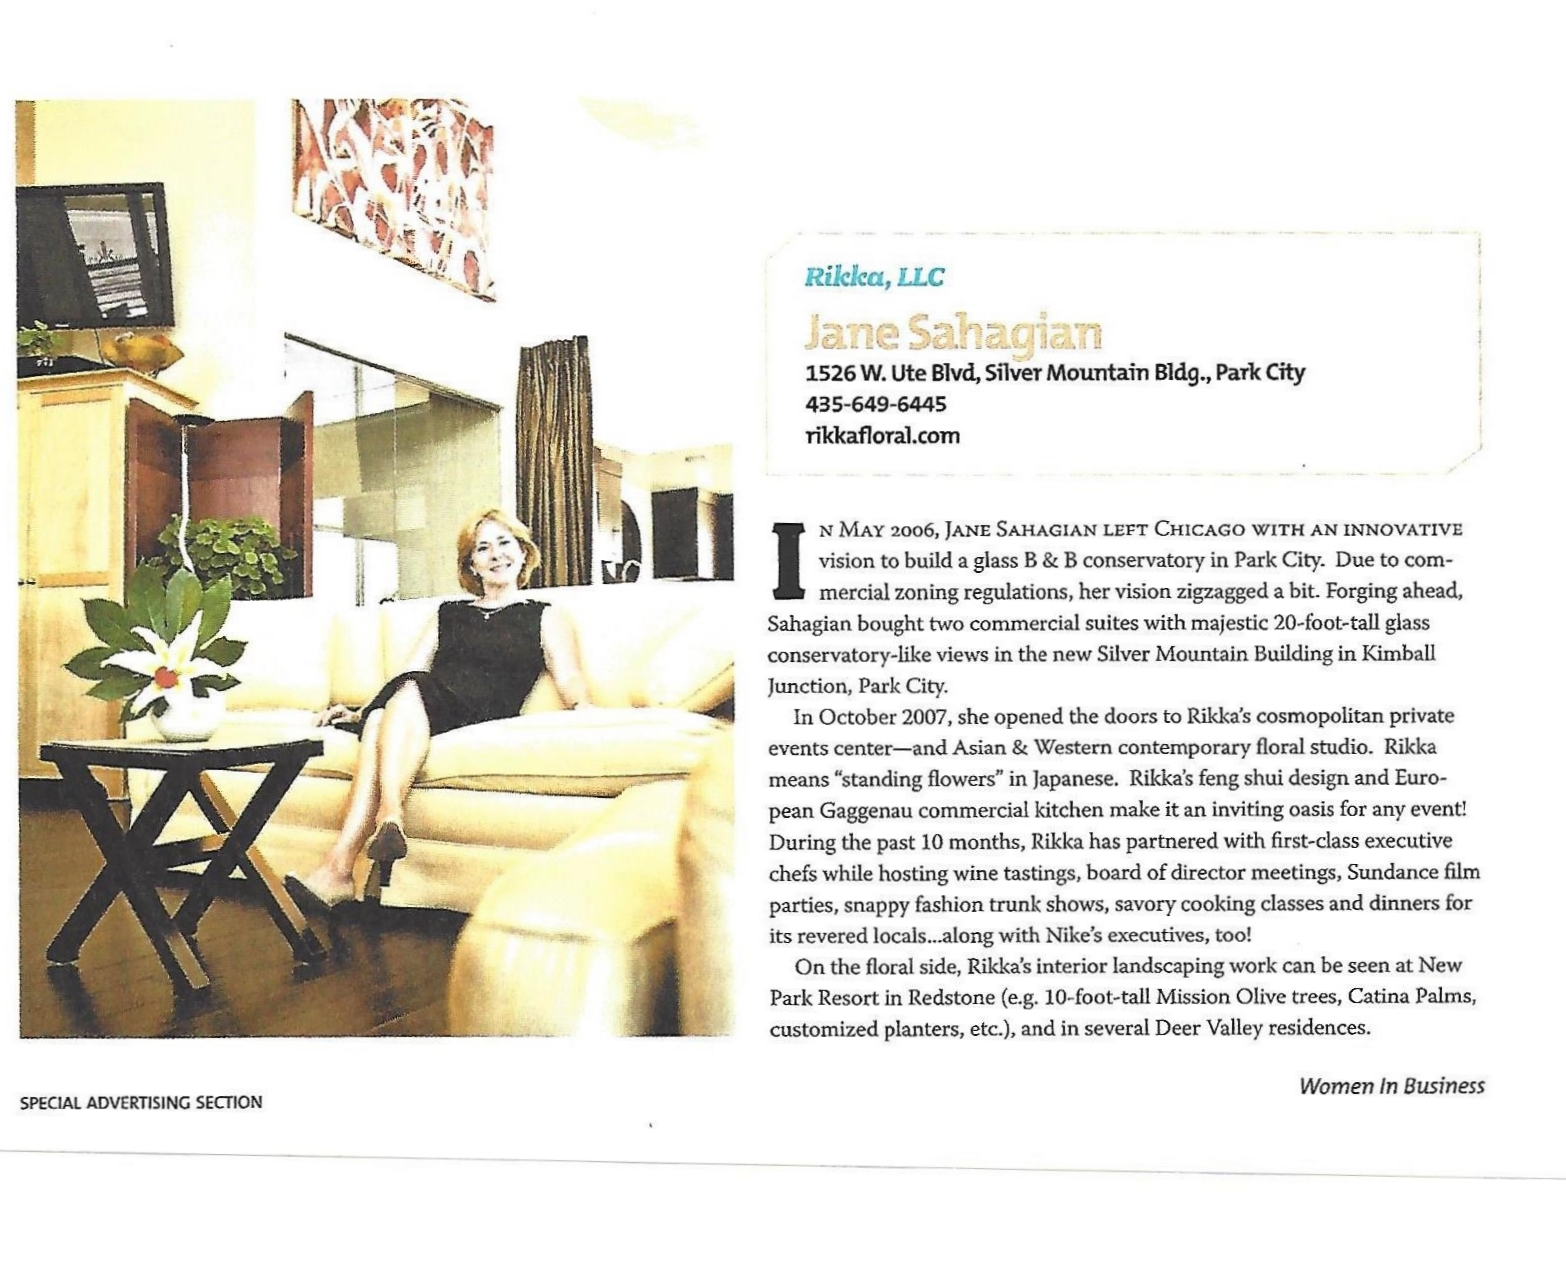 Women in Business (Salt Lake Magazine Oct. 2008) - Article on Rikka, LLC_Page_2.jpg